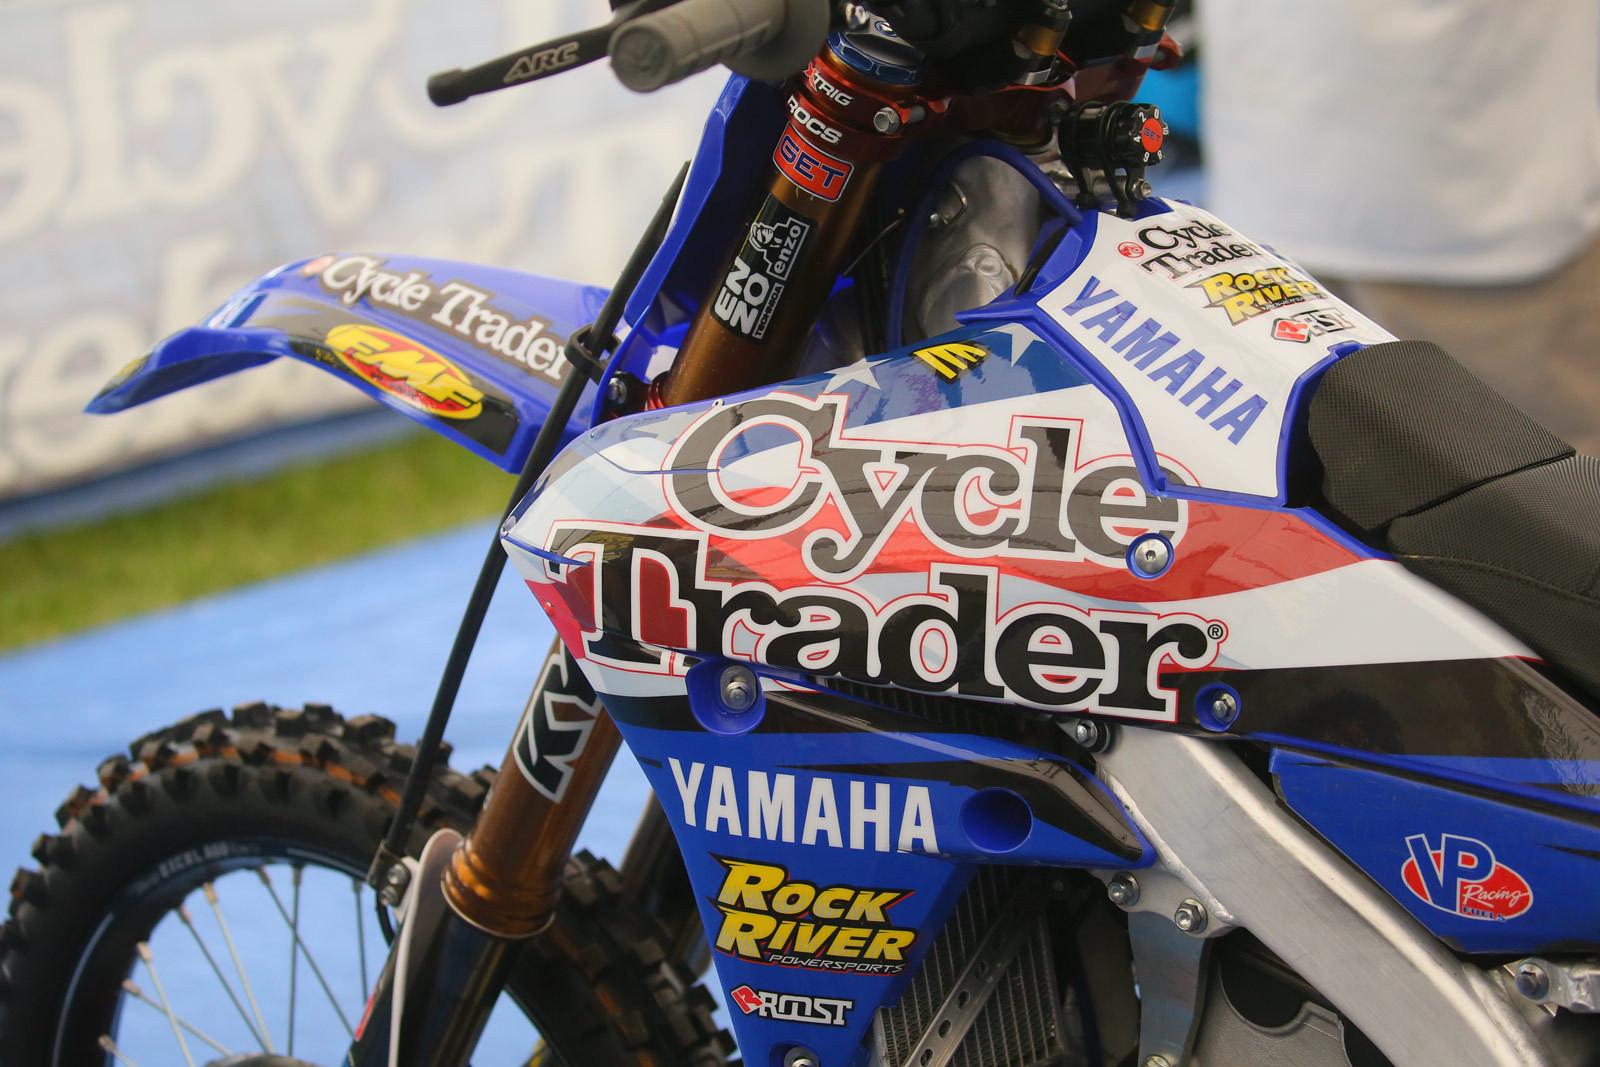 CycleTrader.com/Rock River/Yamaha - Vital MX Pit Bits: RedBud - Motocross Pictures - Vital MX